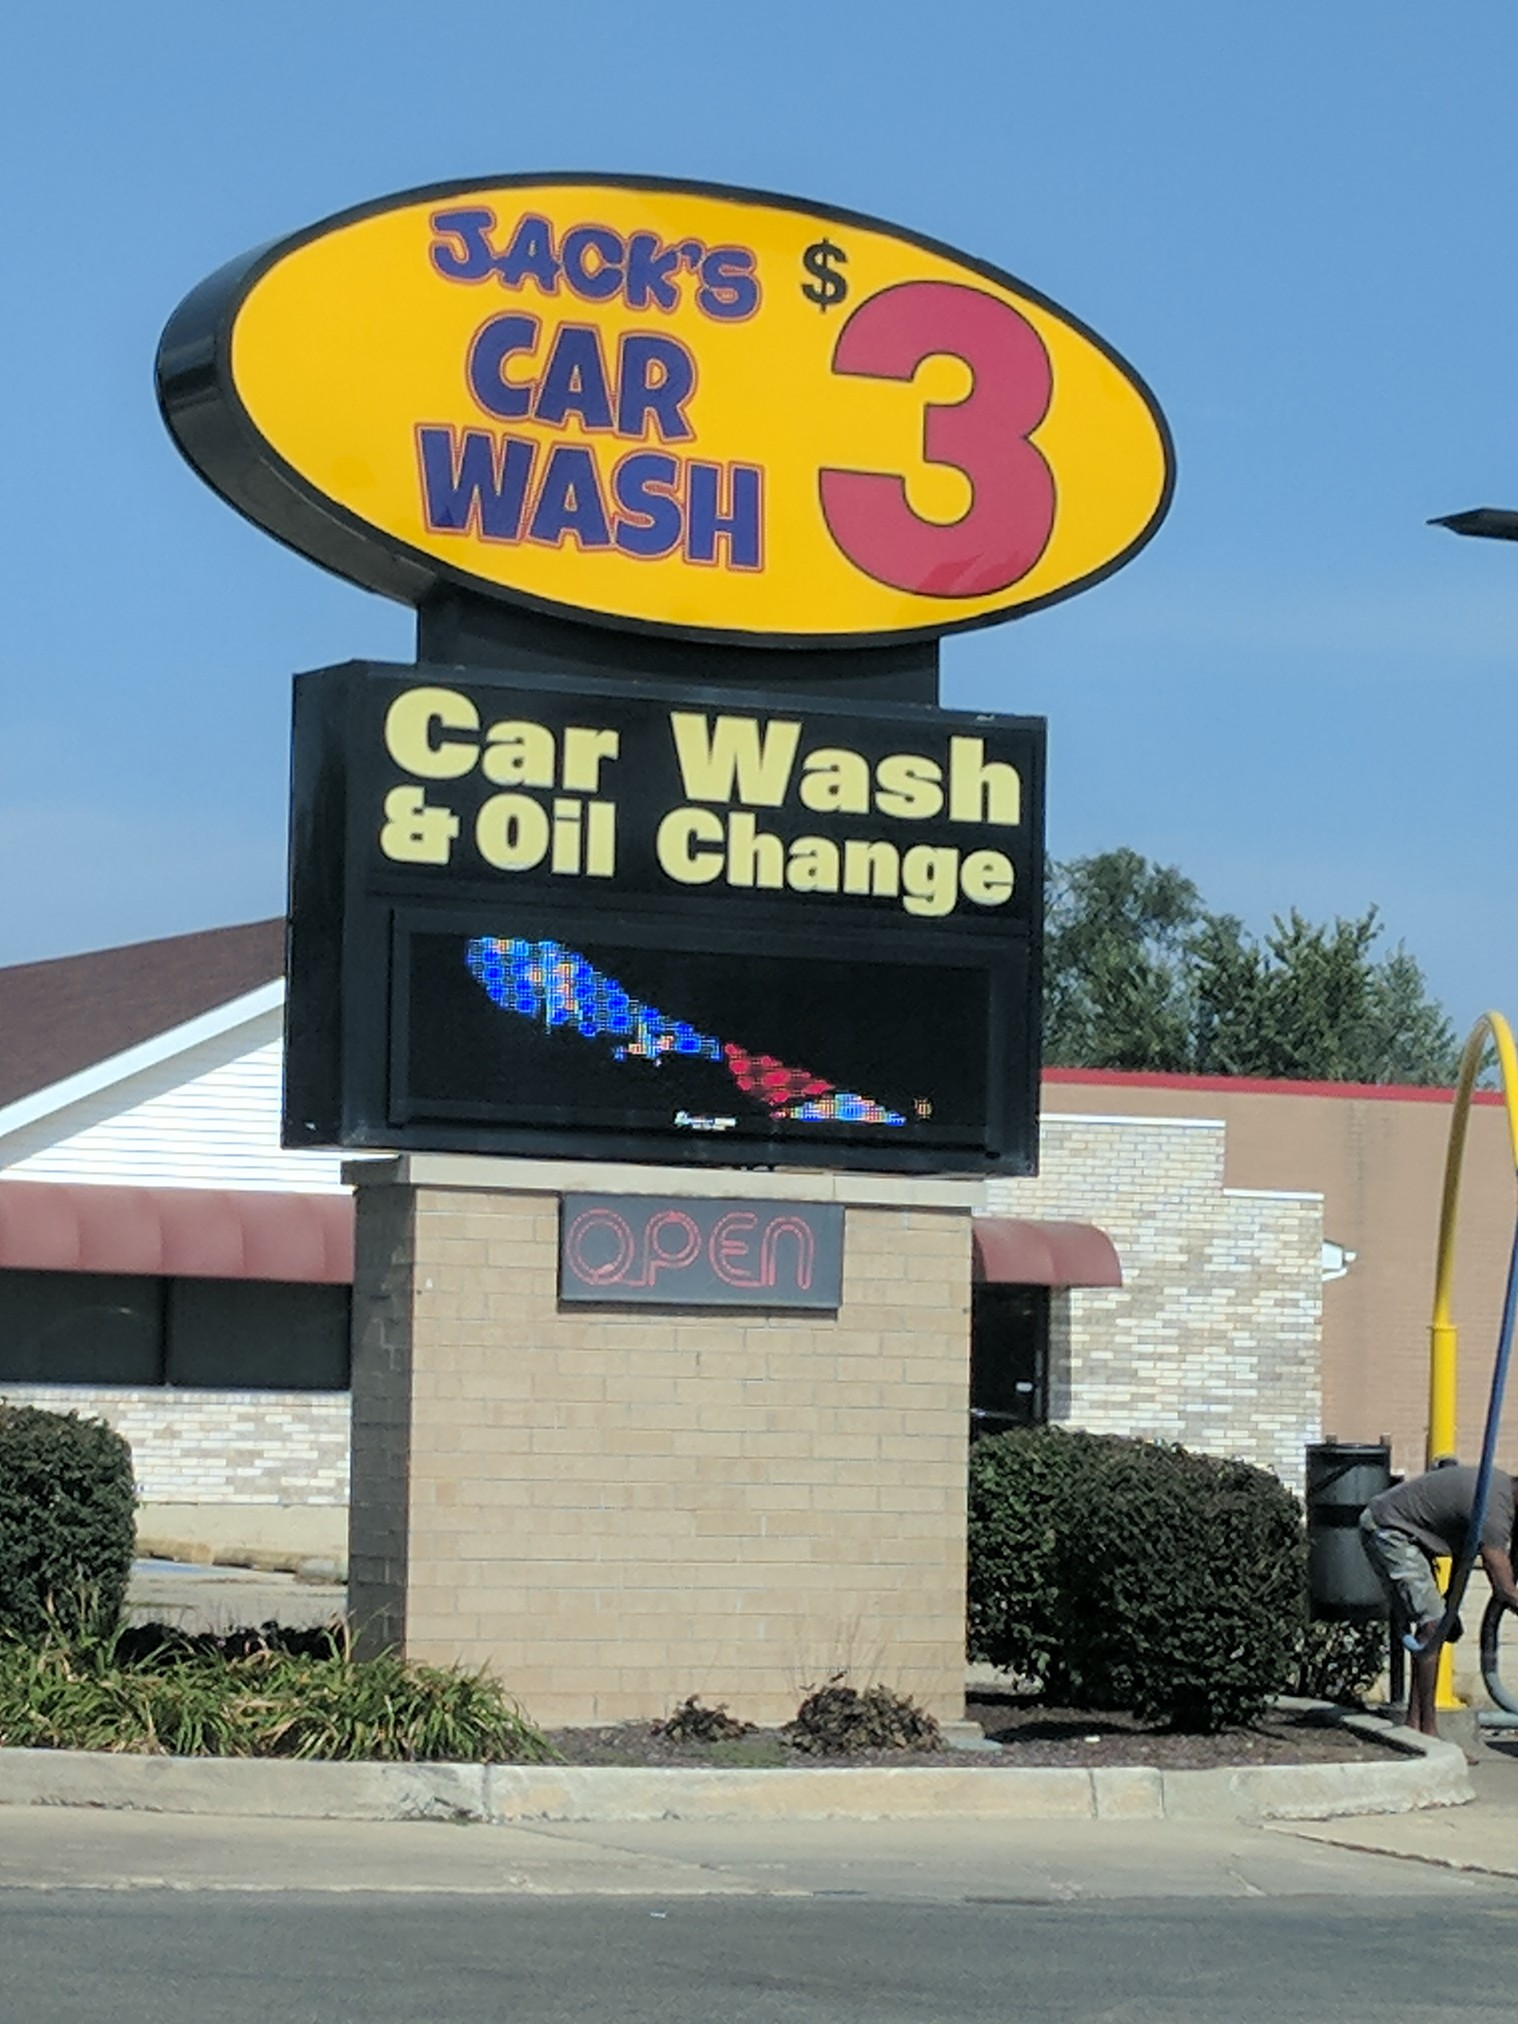 Jacks car wash and oil lube 1720 essington rd joliet il 60435 jacks car wash and oil lube 1720 essington rd joliet il 60435 yp solutioingenieria Gallery